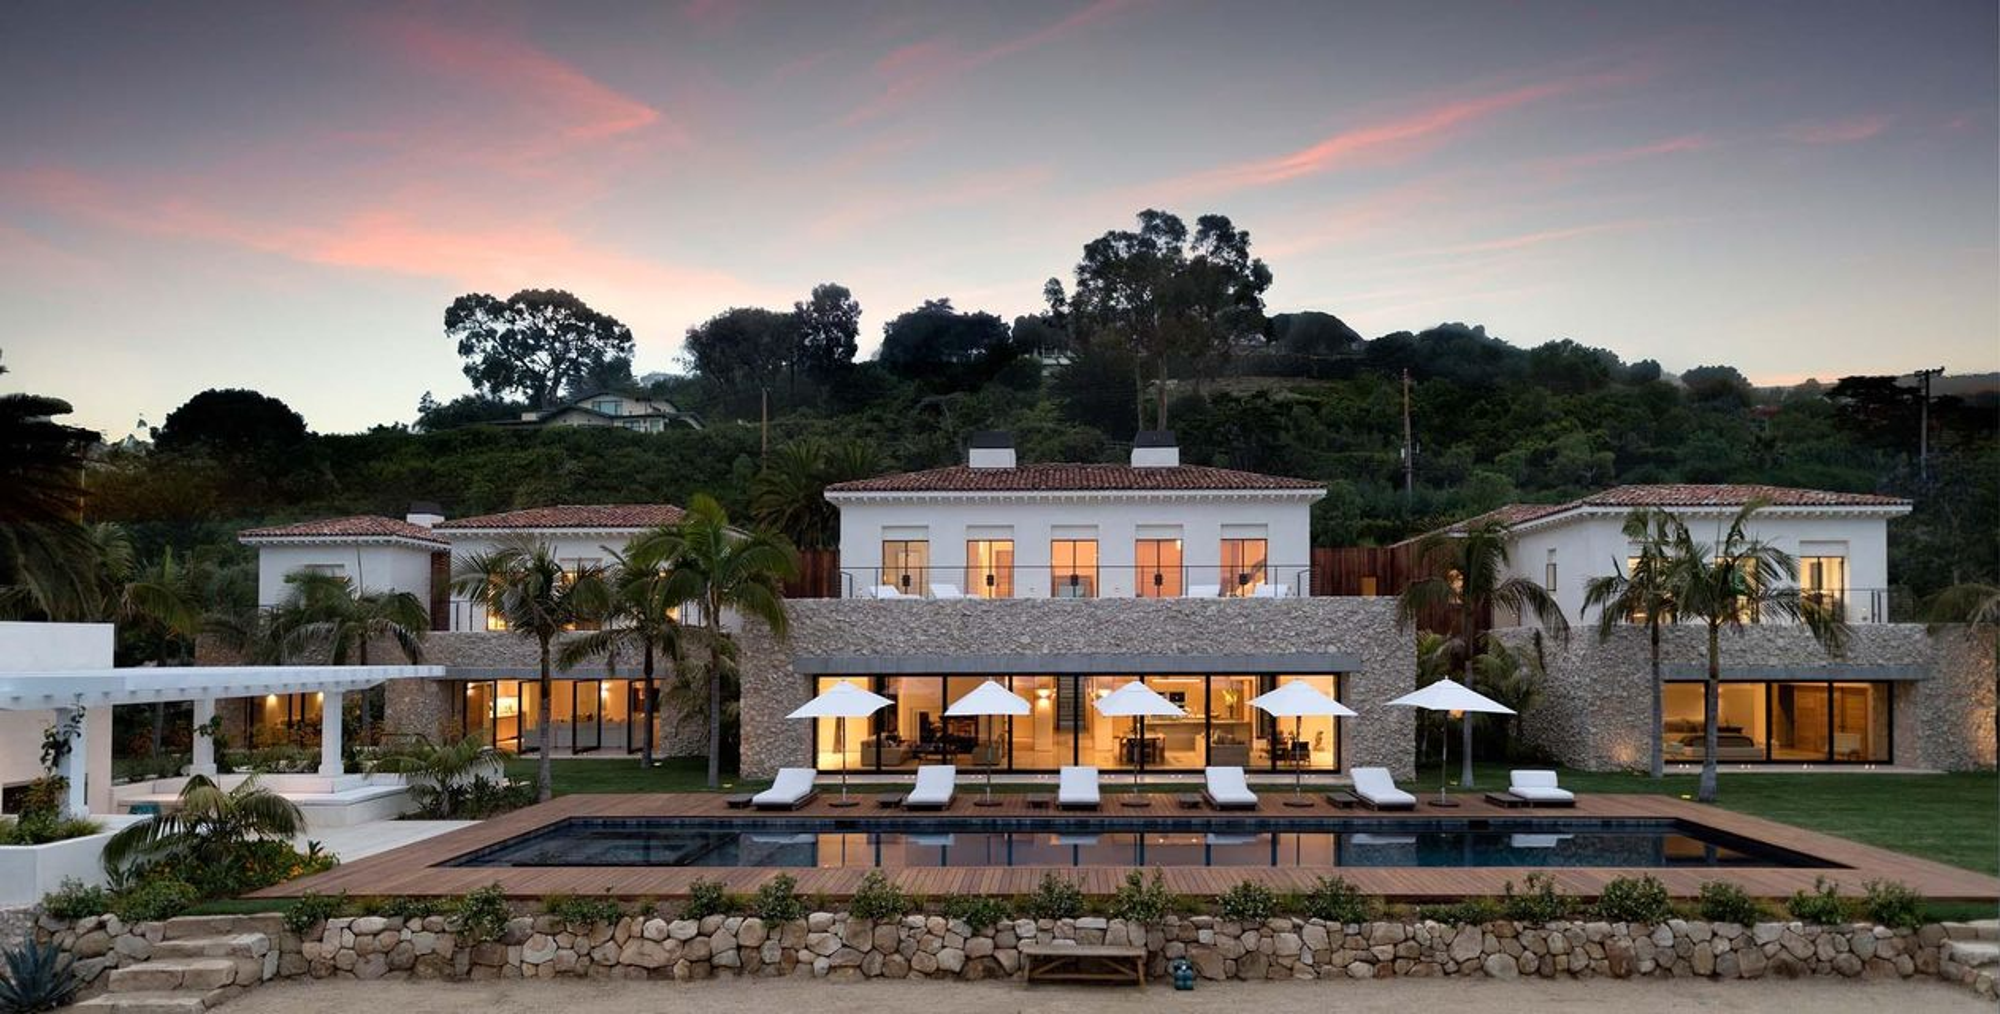 Single Family Home for Sale at 4160 La Ladera Rd Santa Barbara, California,93110 United States